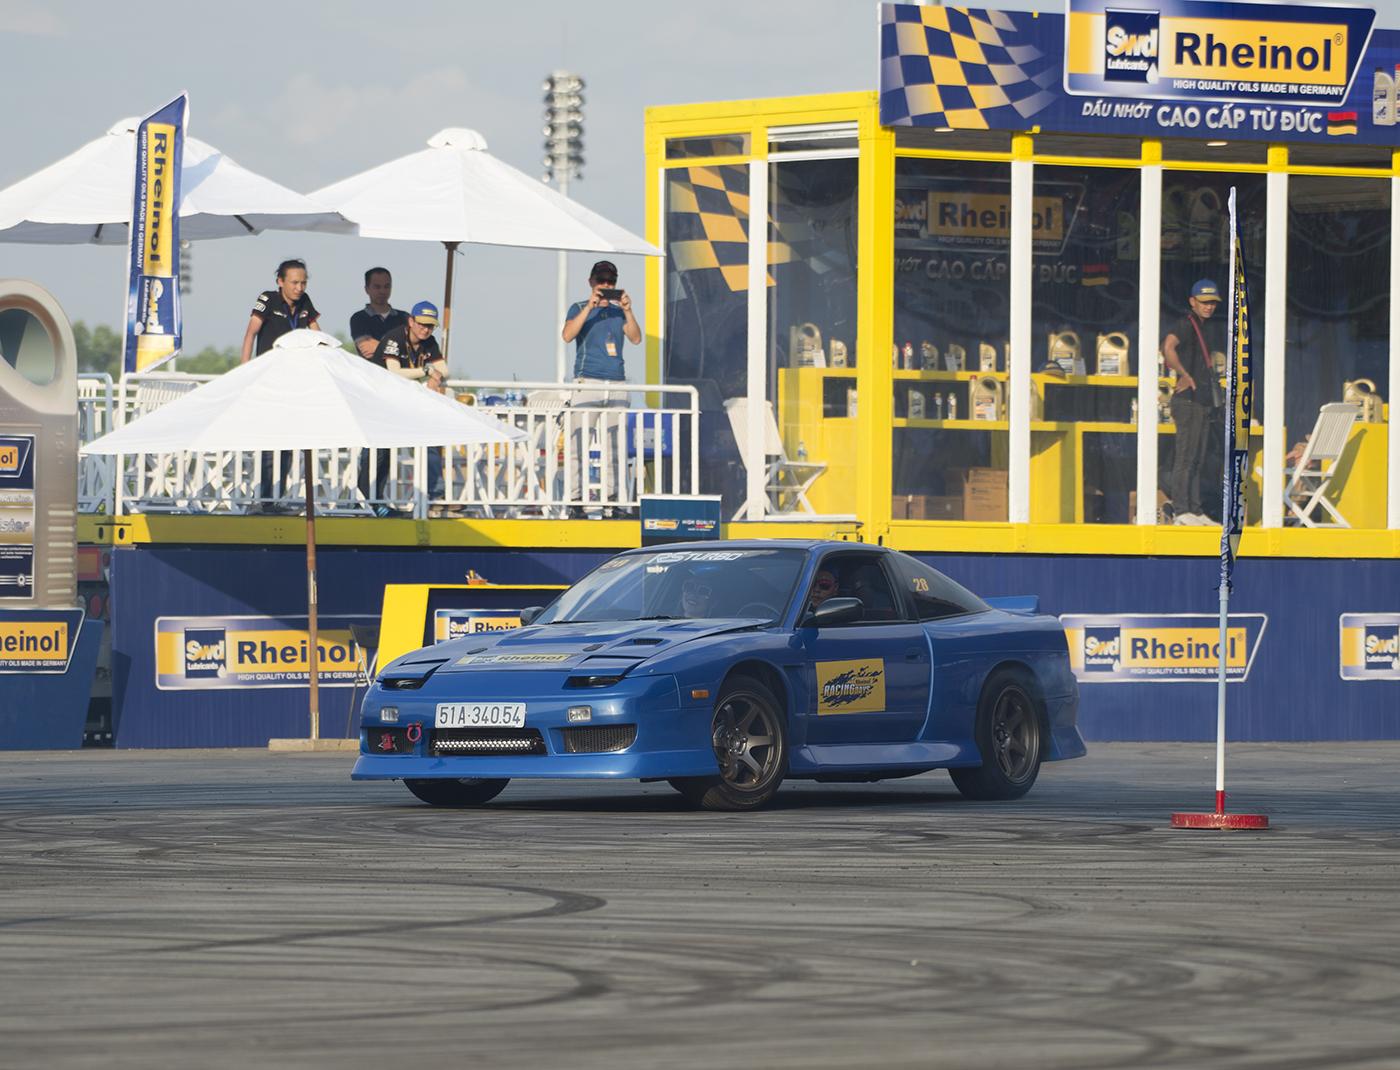 rheinol-racing-days-autodaily-0-77.jpg